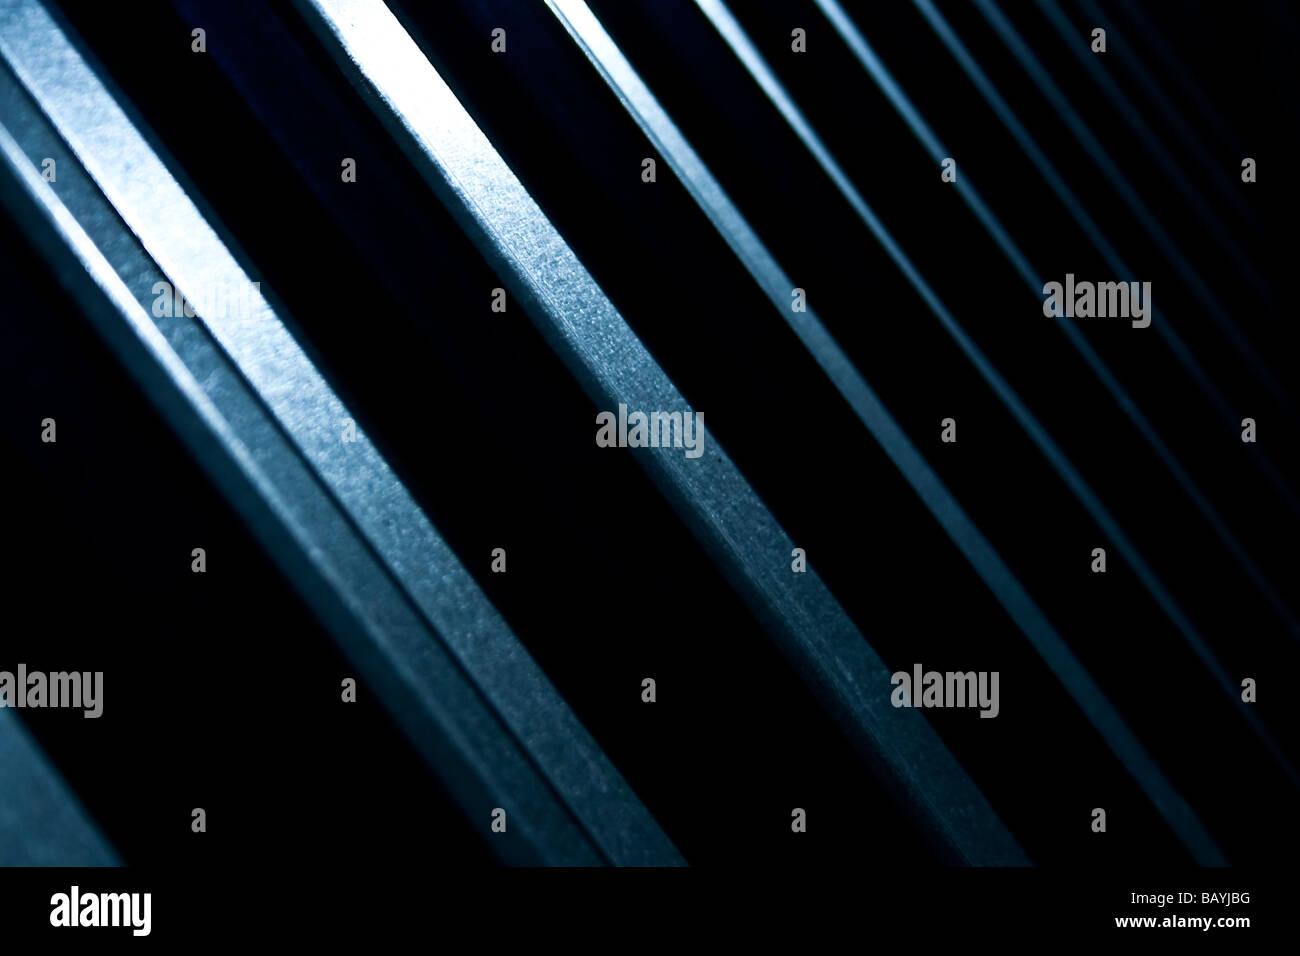 La arquitectura abstracta Imagen De Stock